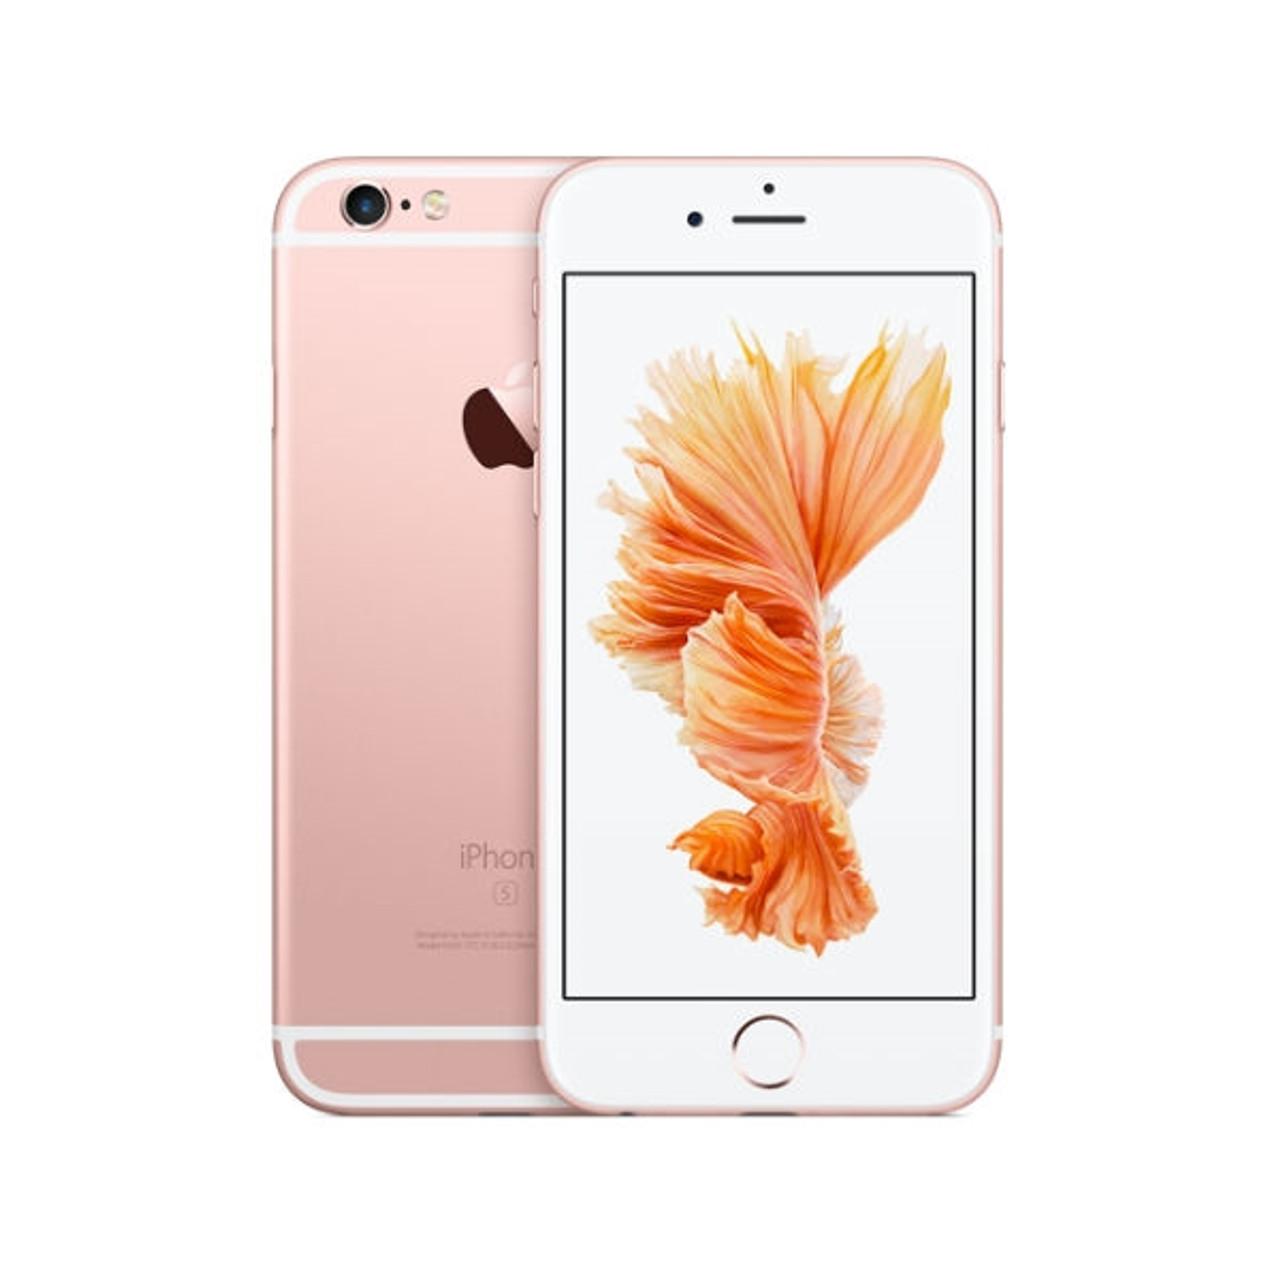 Apple Iphone 6s Unlocked 32gb Rose Gold Mn1v2ll A Good Mac